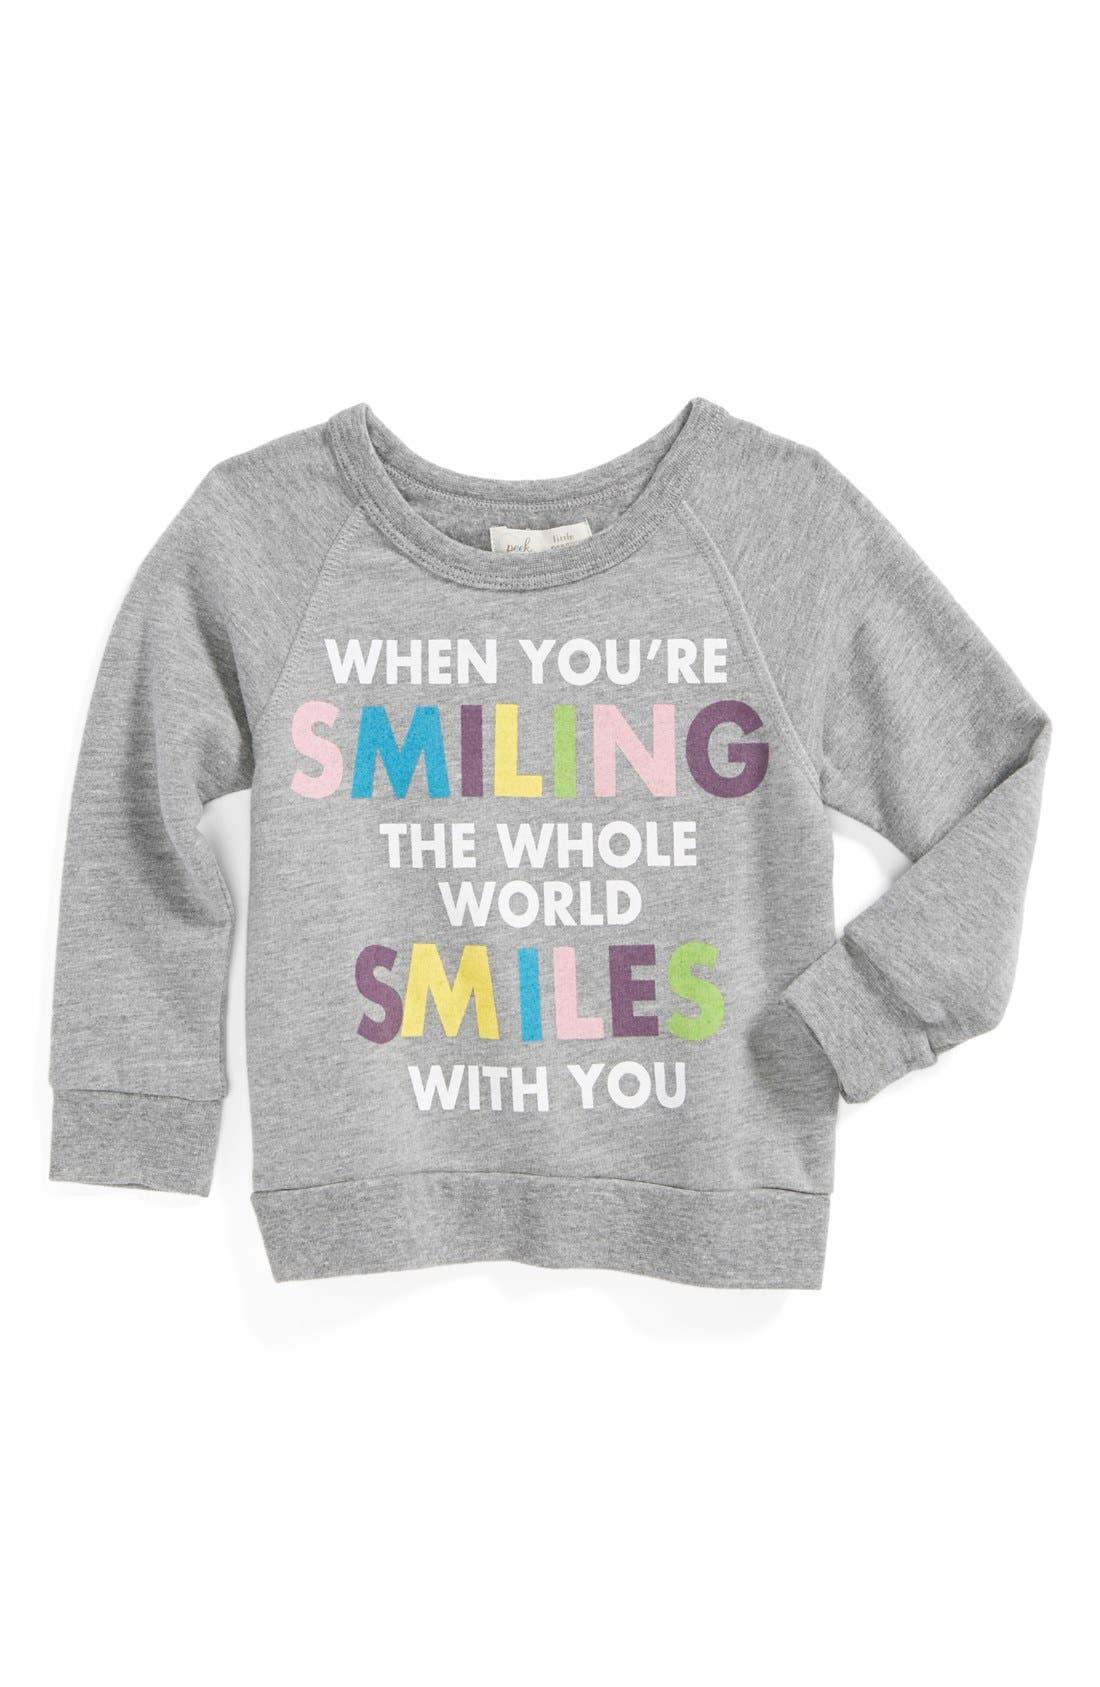 Alternate Image 1 Selected - Peek 'When You're Smiling' Sweatshirt (Baby Girls)